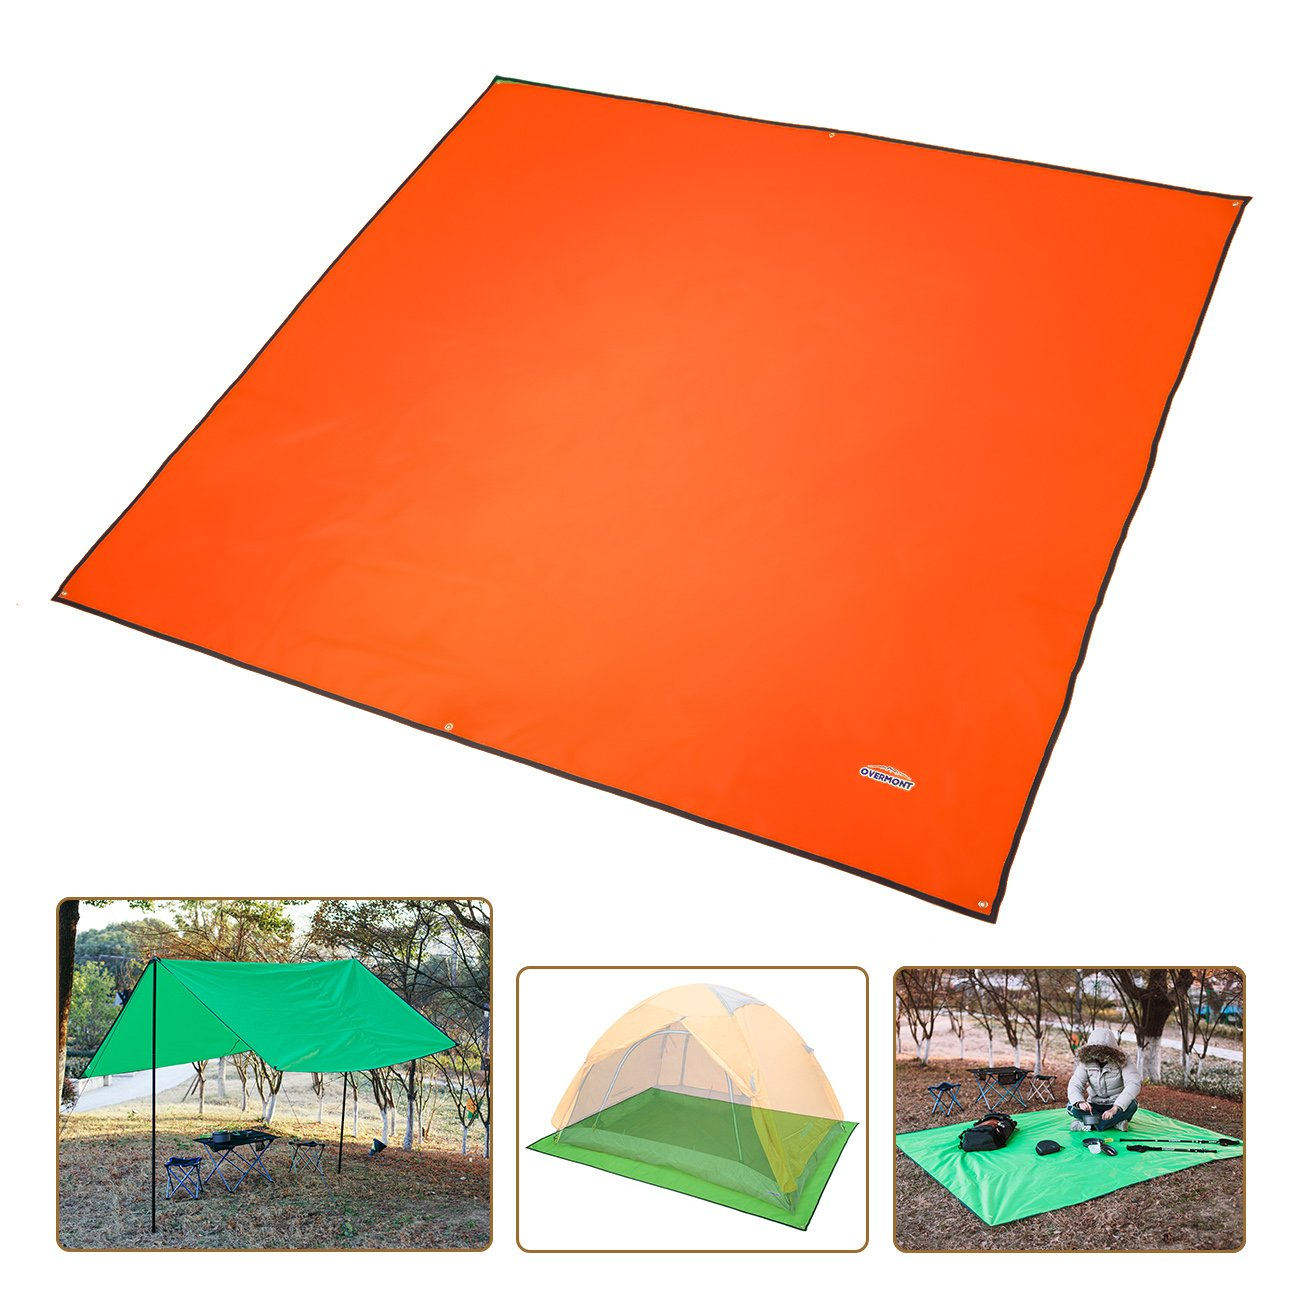 Overmont estera toldo alfombrilla manta impermeable plegable con bolsa para tienda de campaña camping picnic playa senderismo al aire libre azul/naranja/verde/verde oscuro OM-RTarp-S(DGreen)